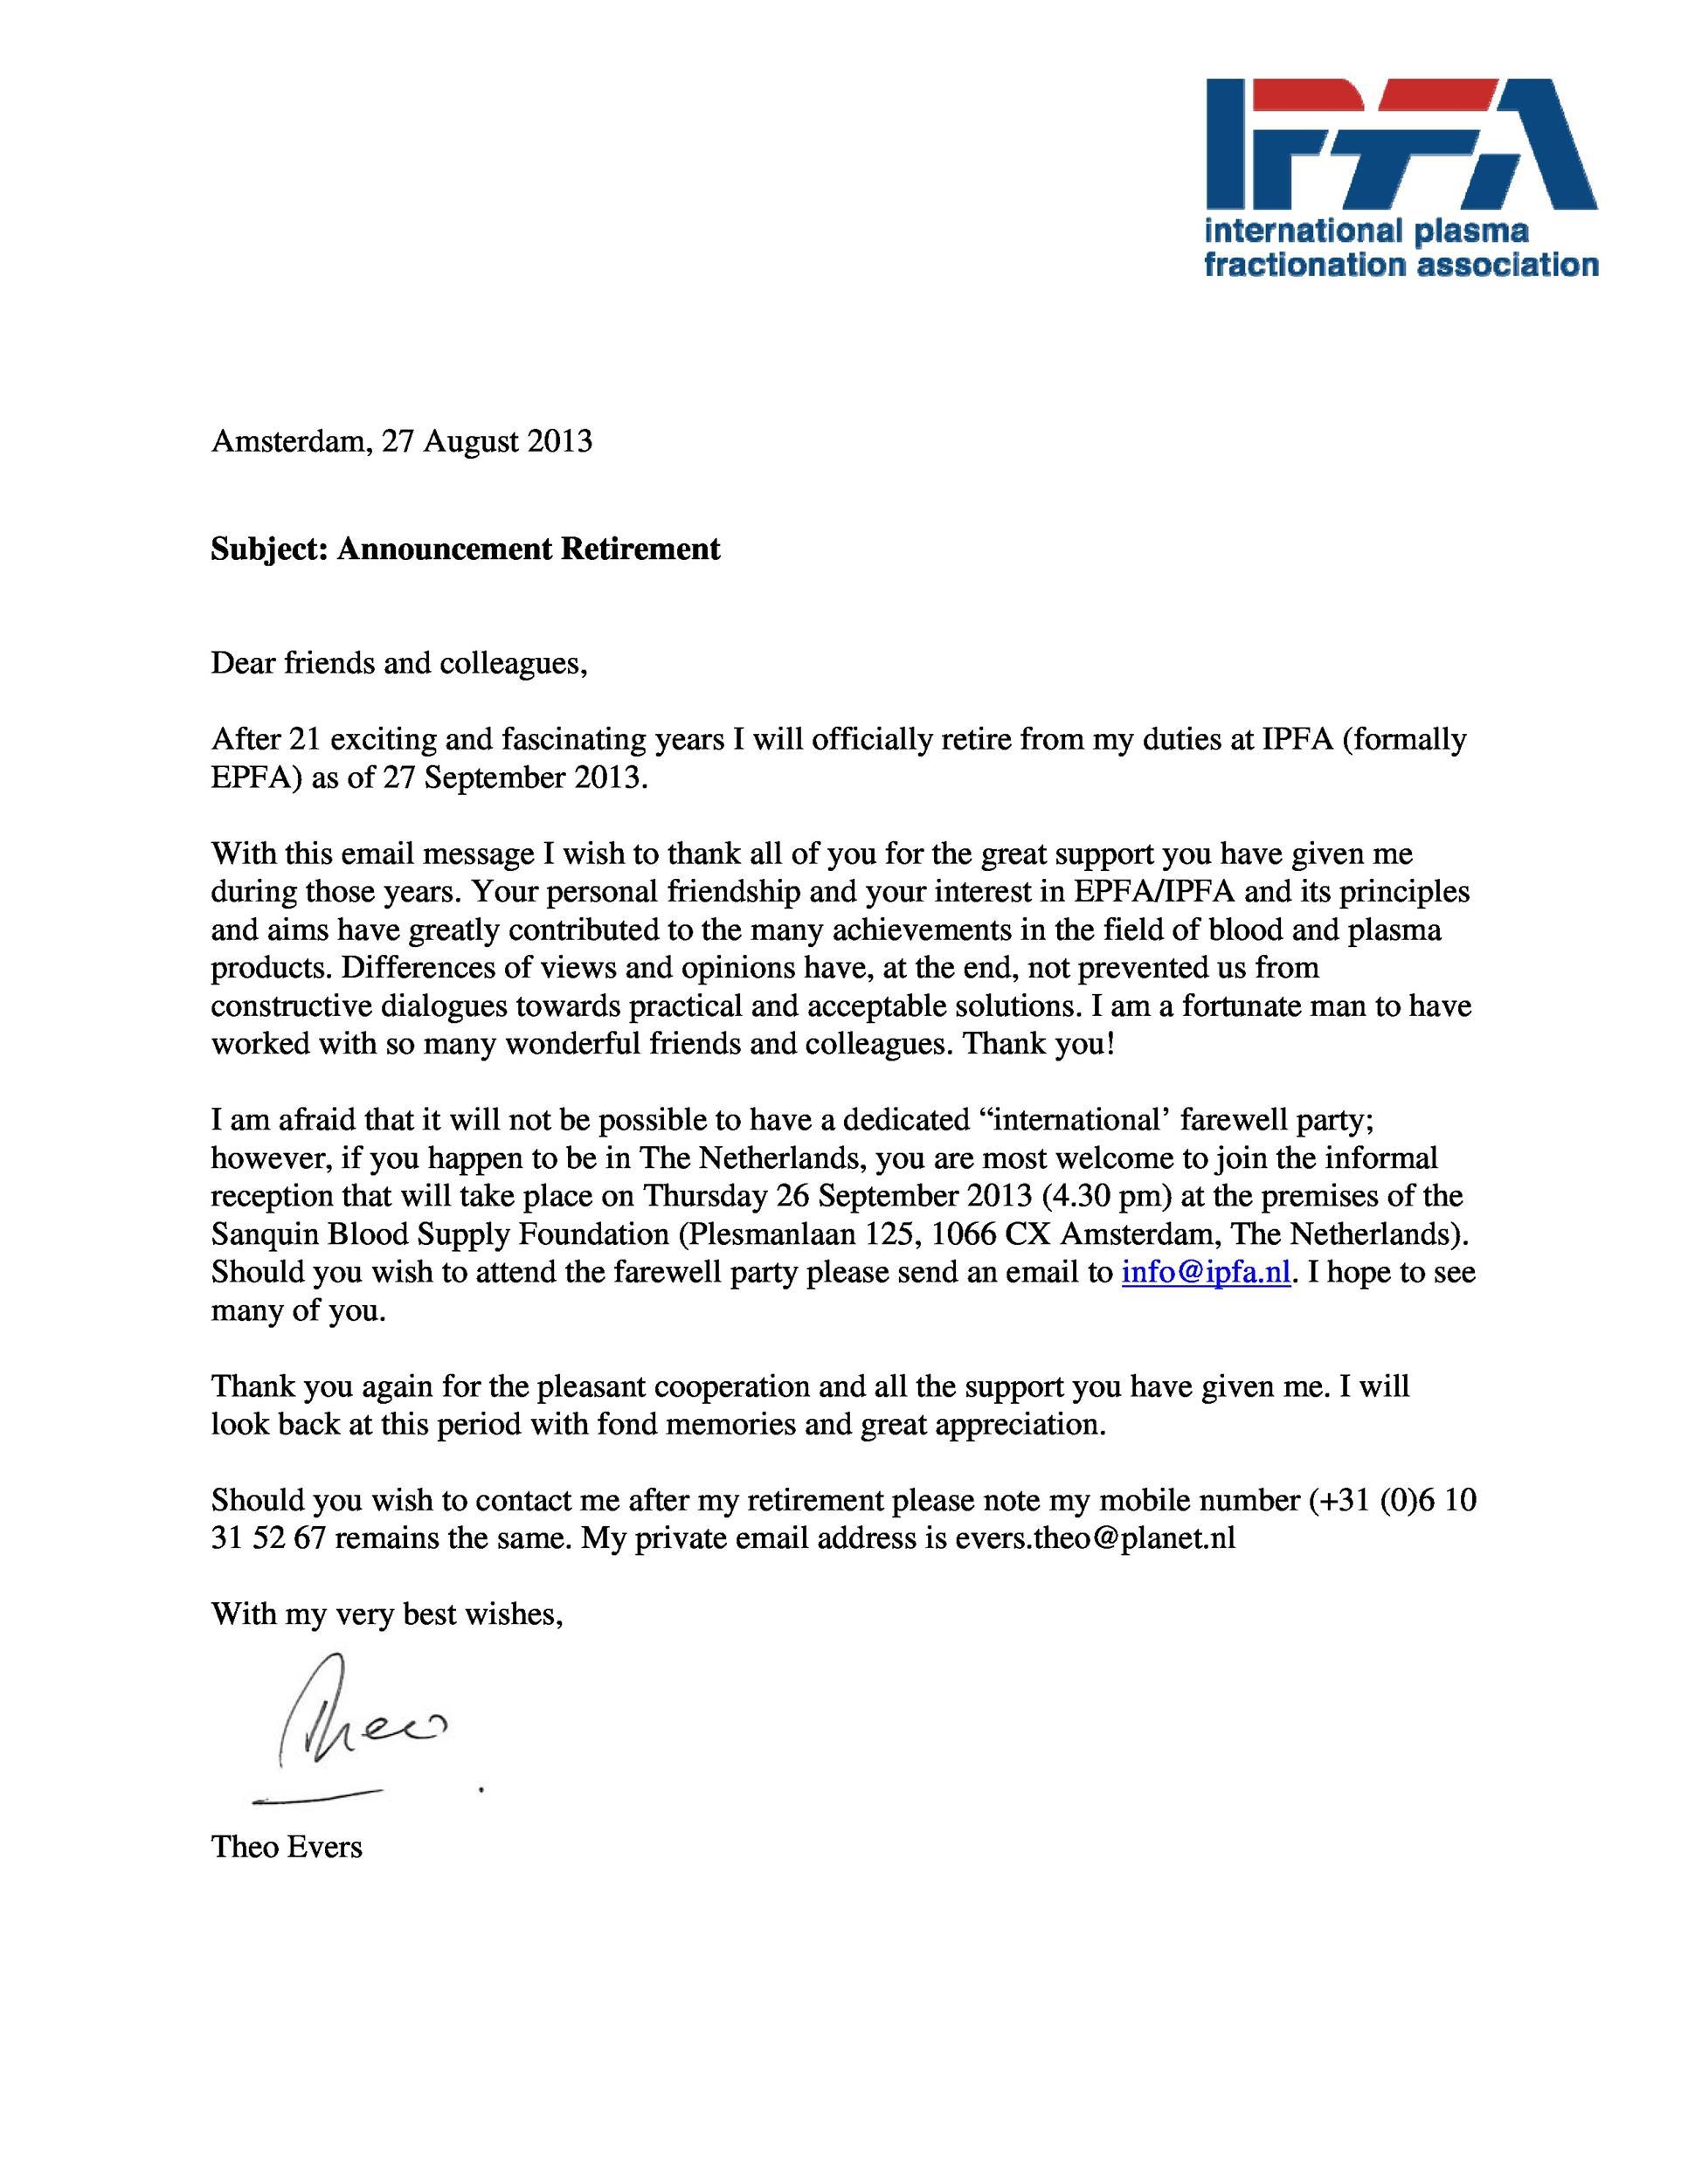 Free retirement announcement template 24